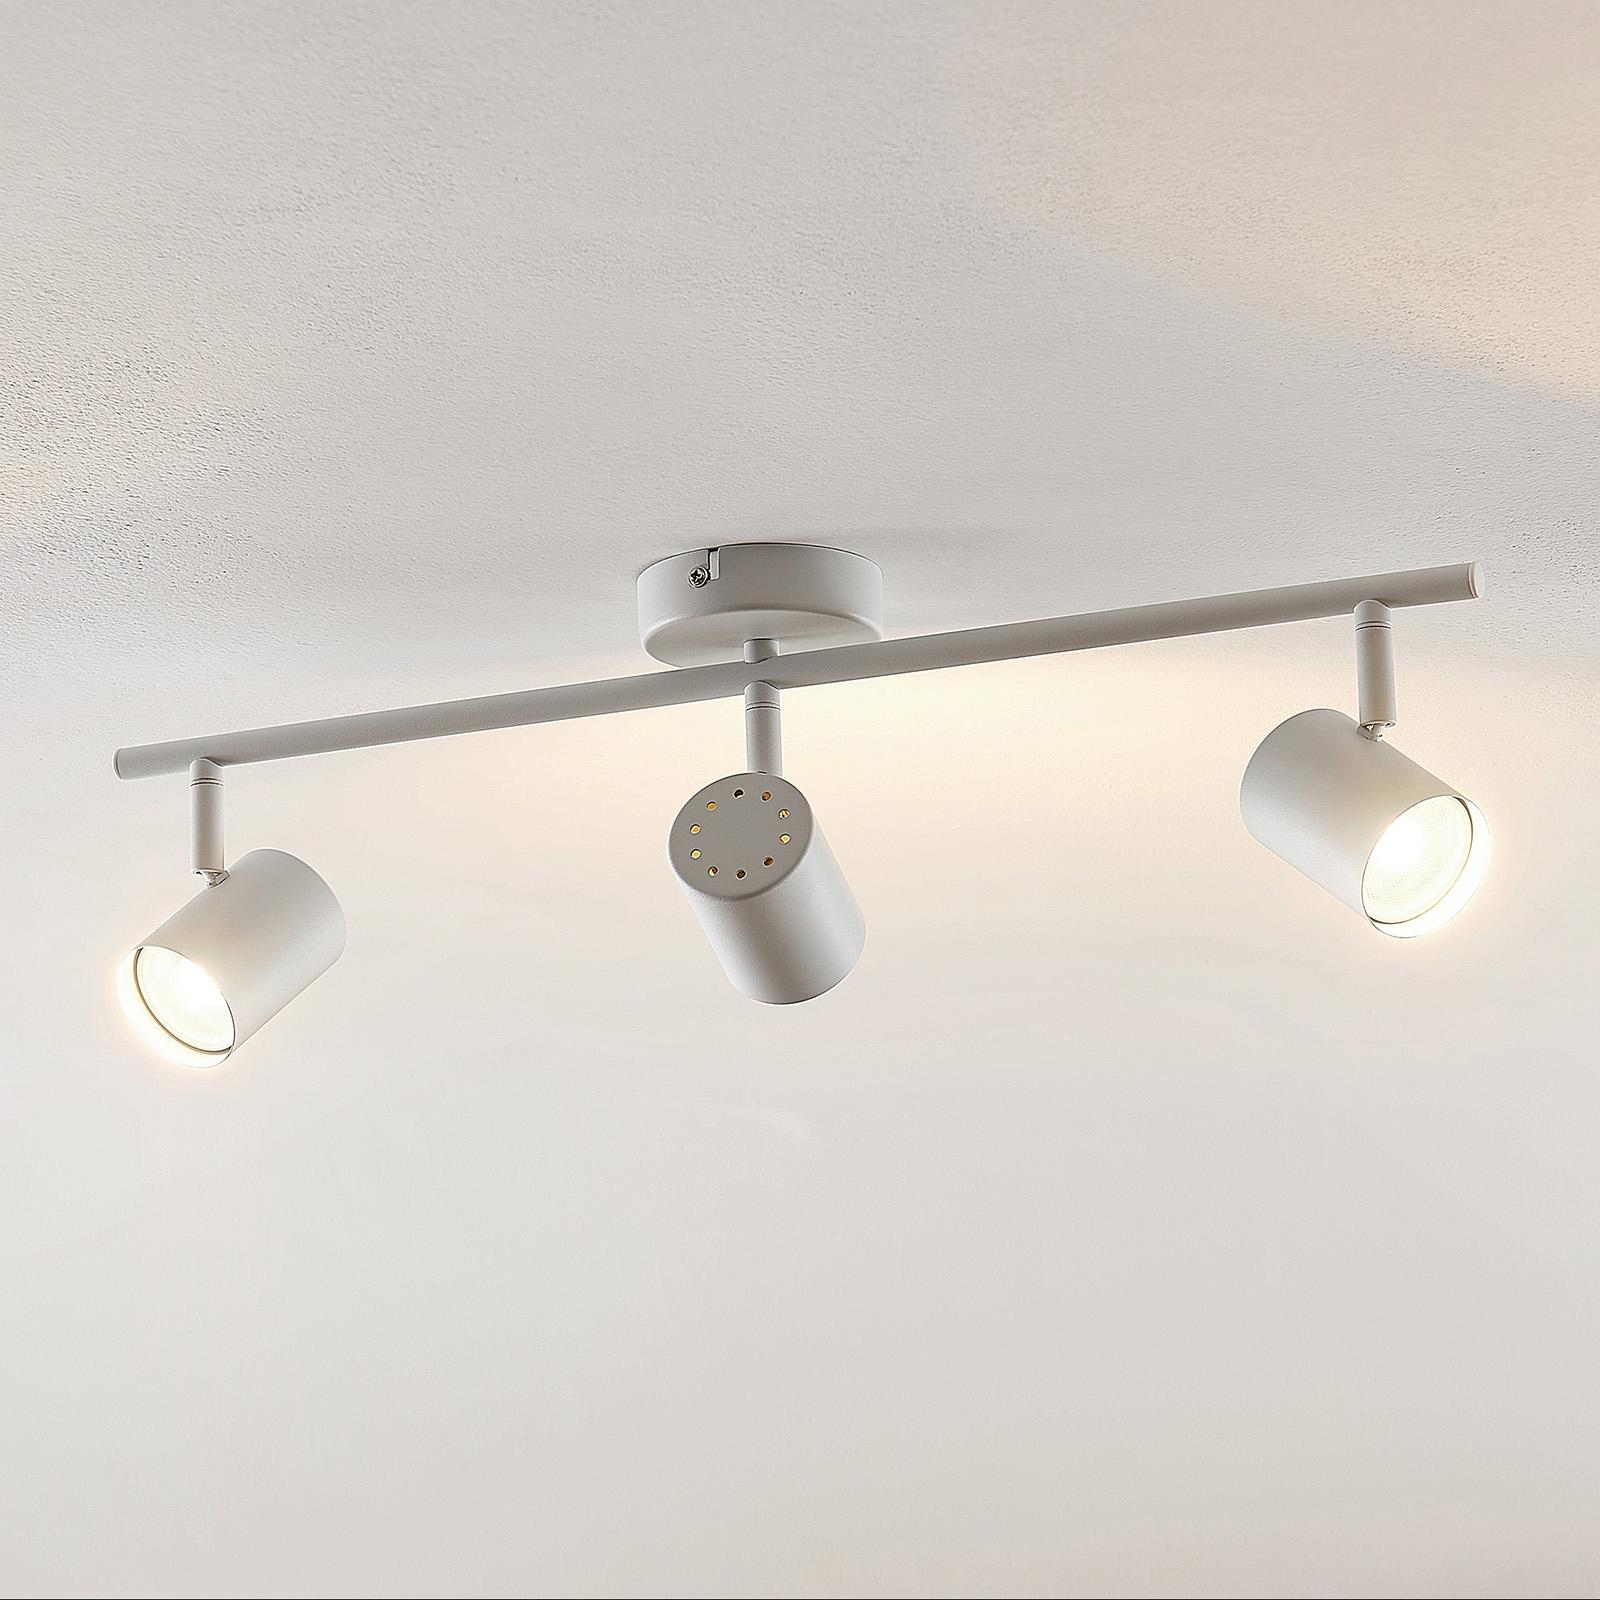 ELC Tomoki -LED-kohdevalo, valkoinen, 3-lamp.